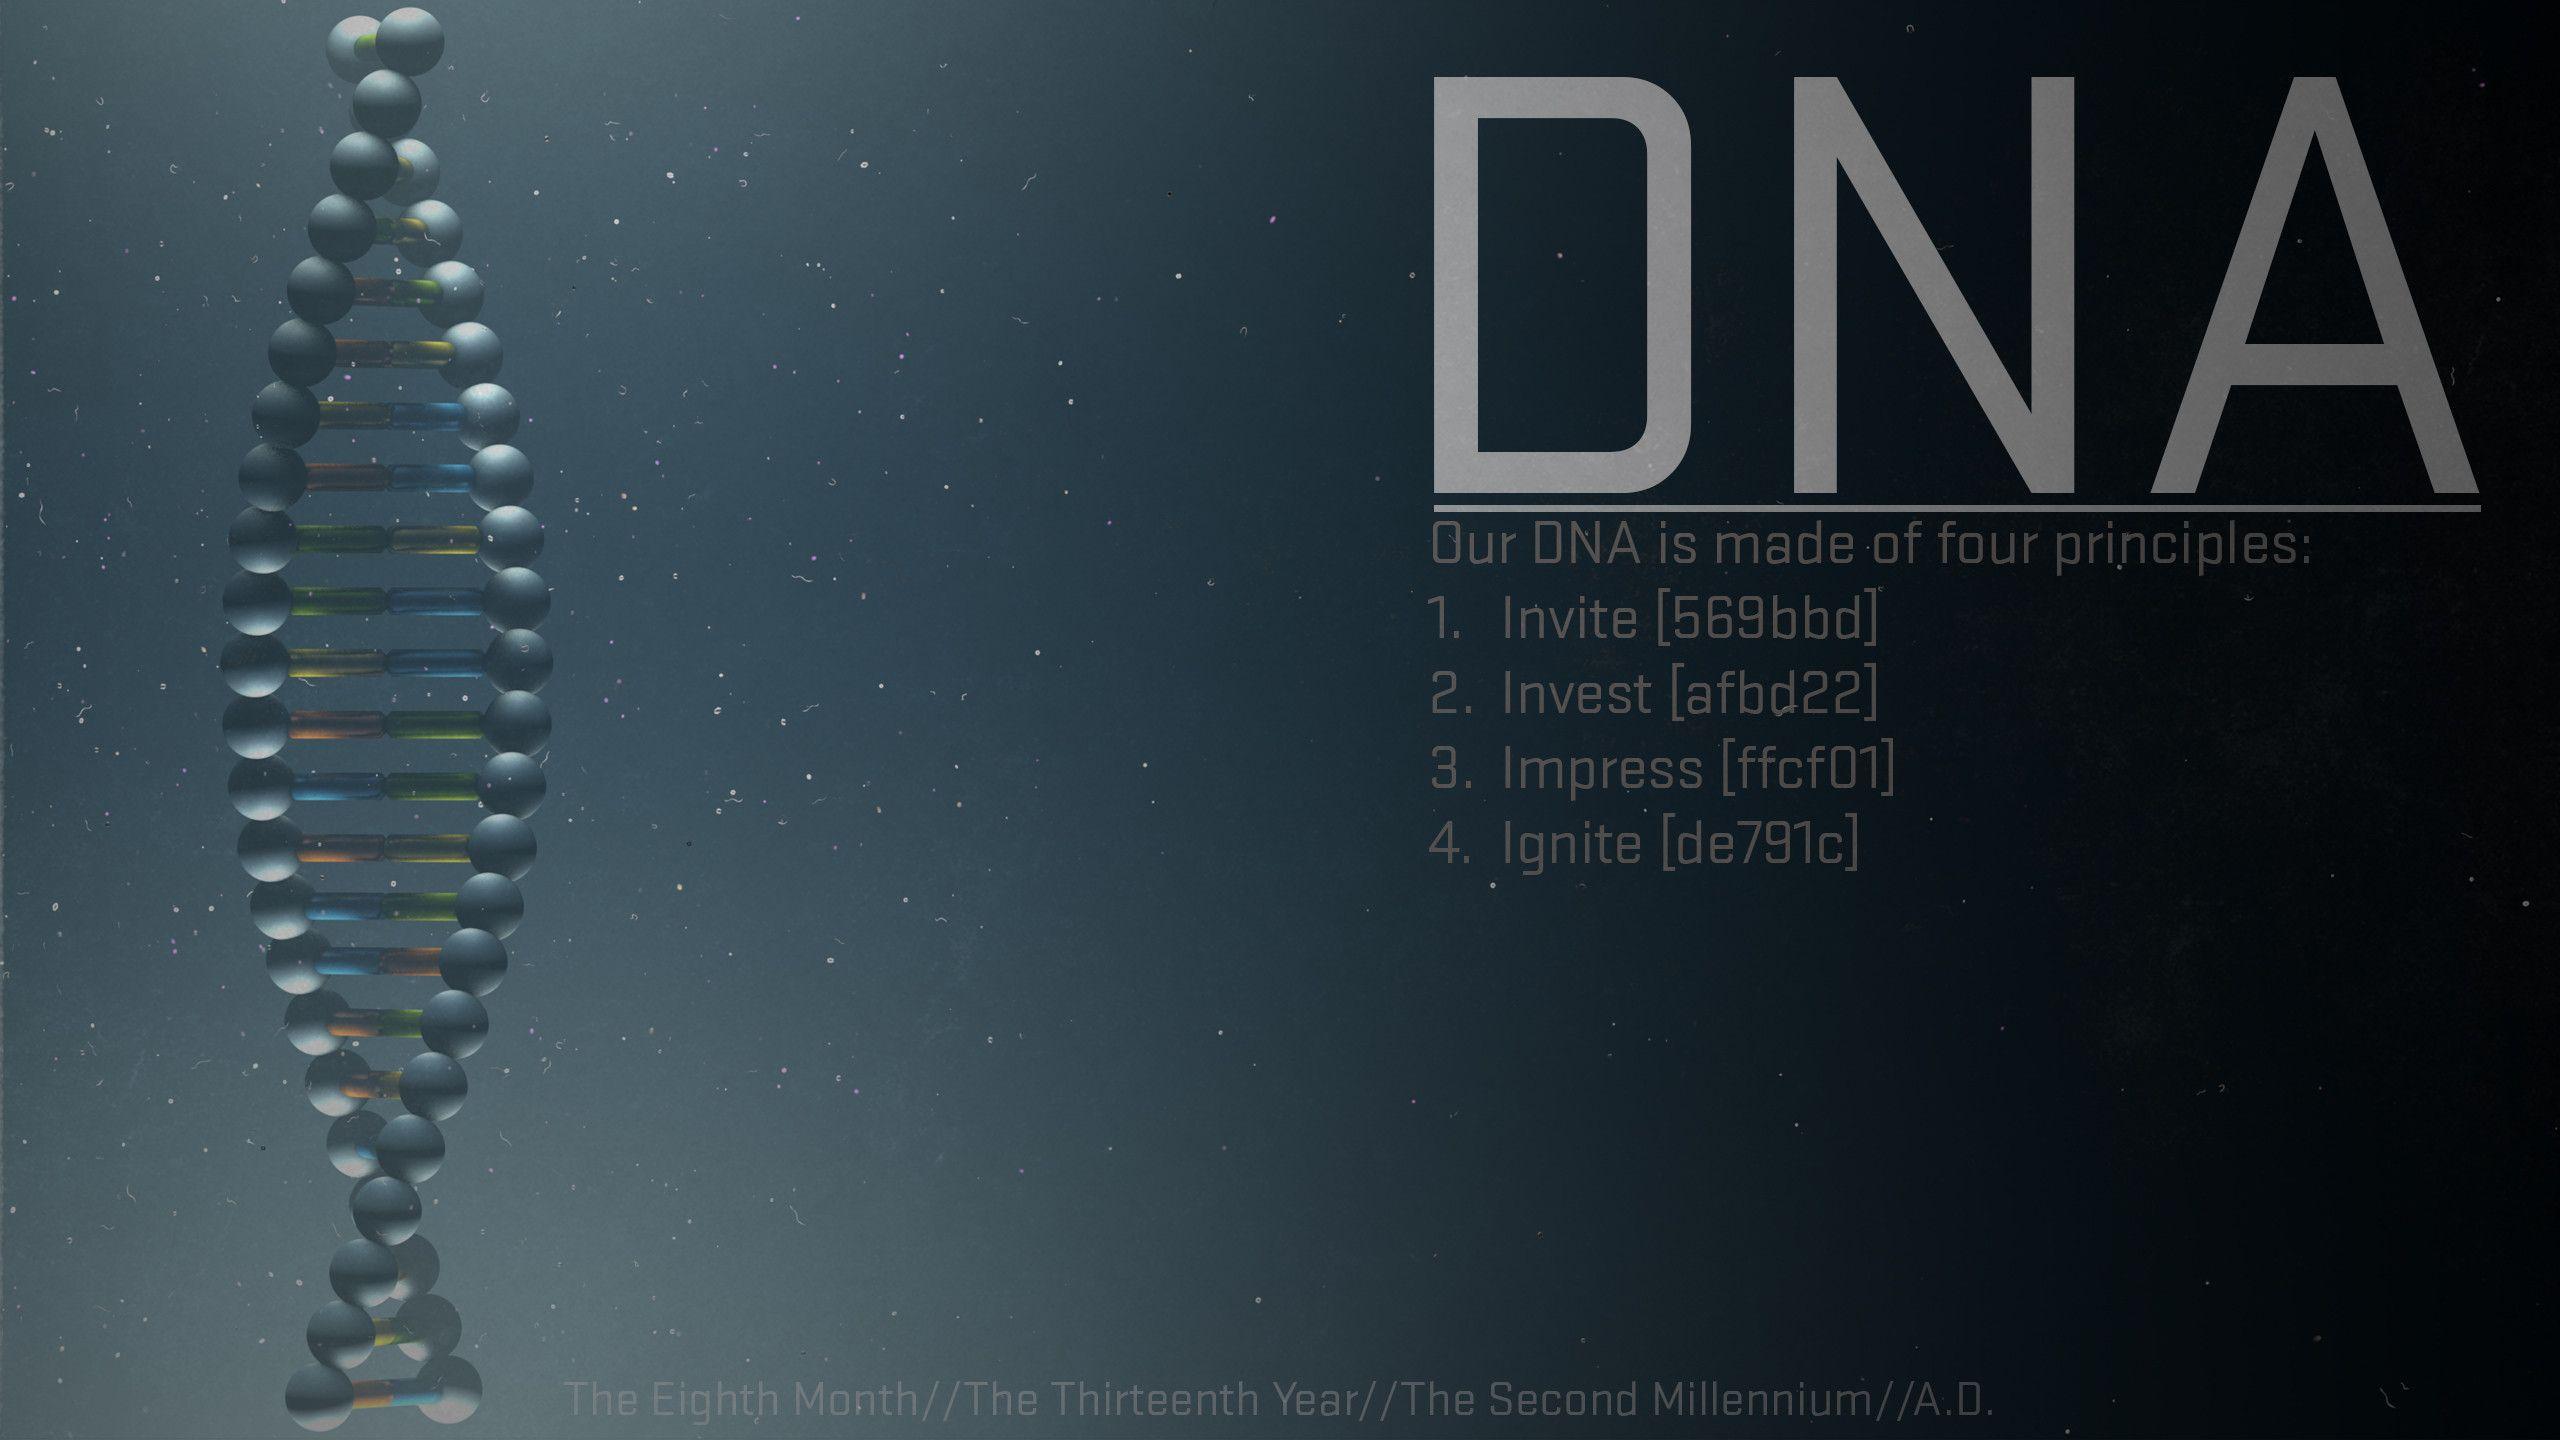 Dna Wallpaper Large HD Wallpaper Database 2560x1440